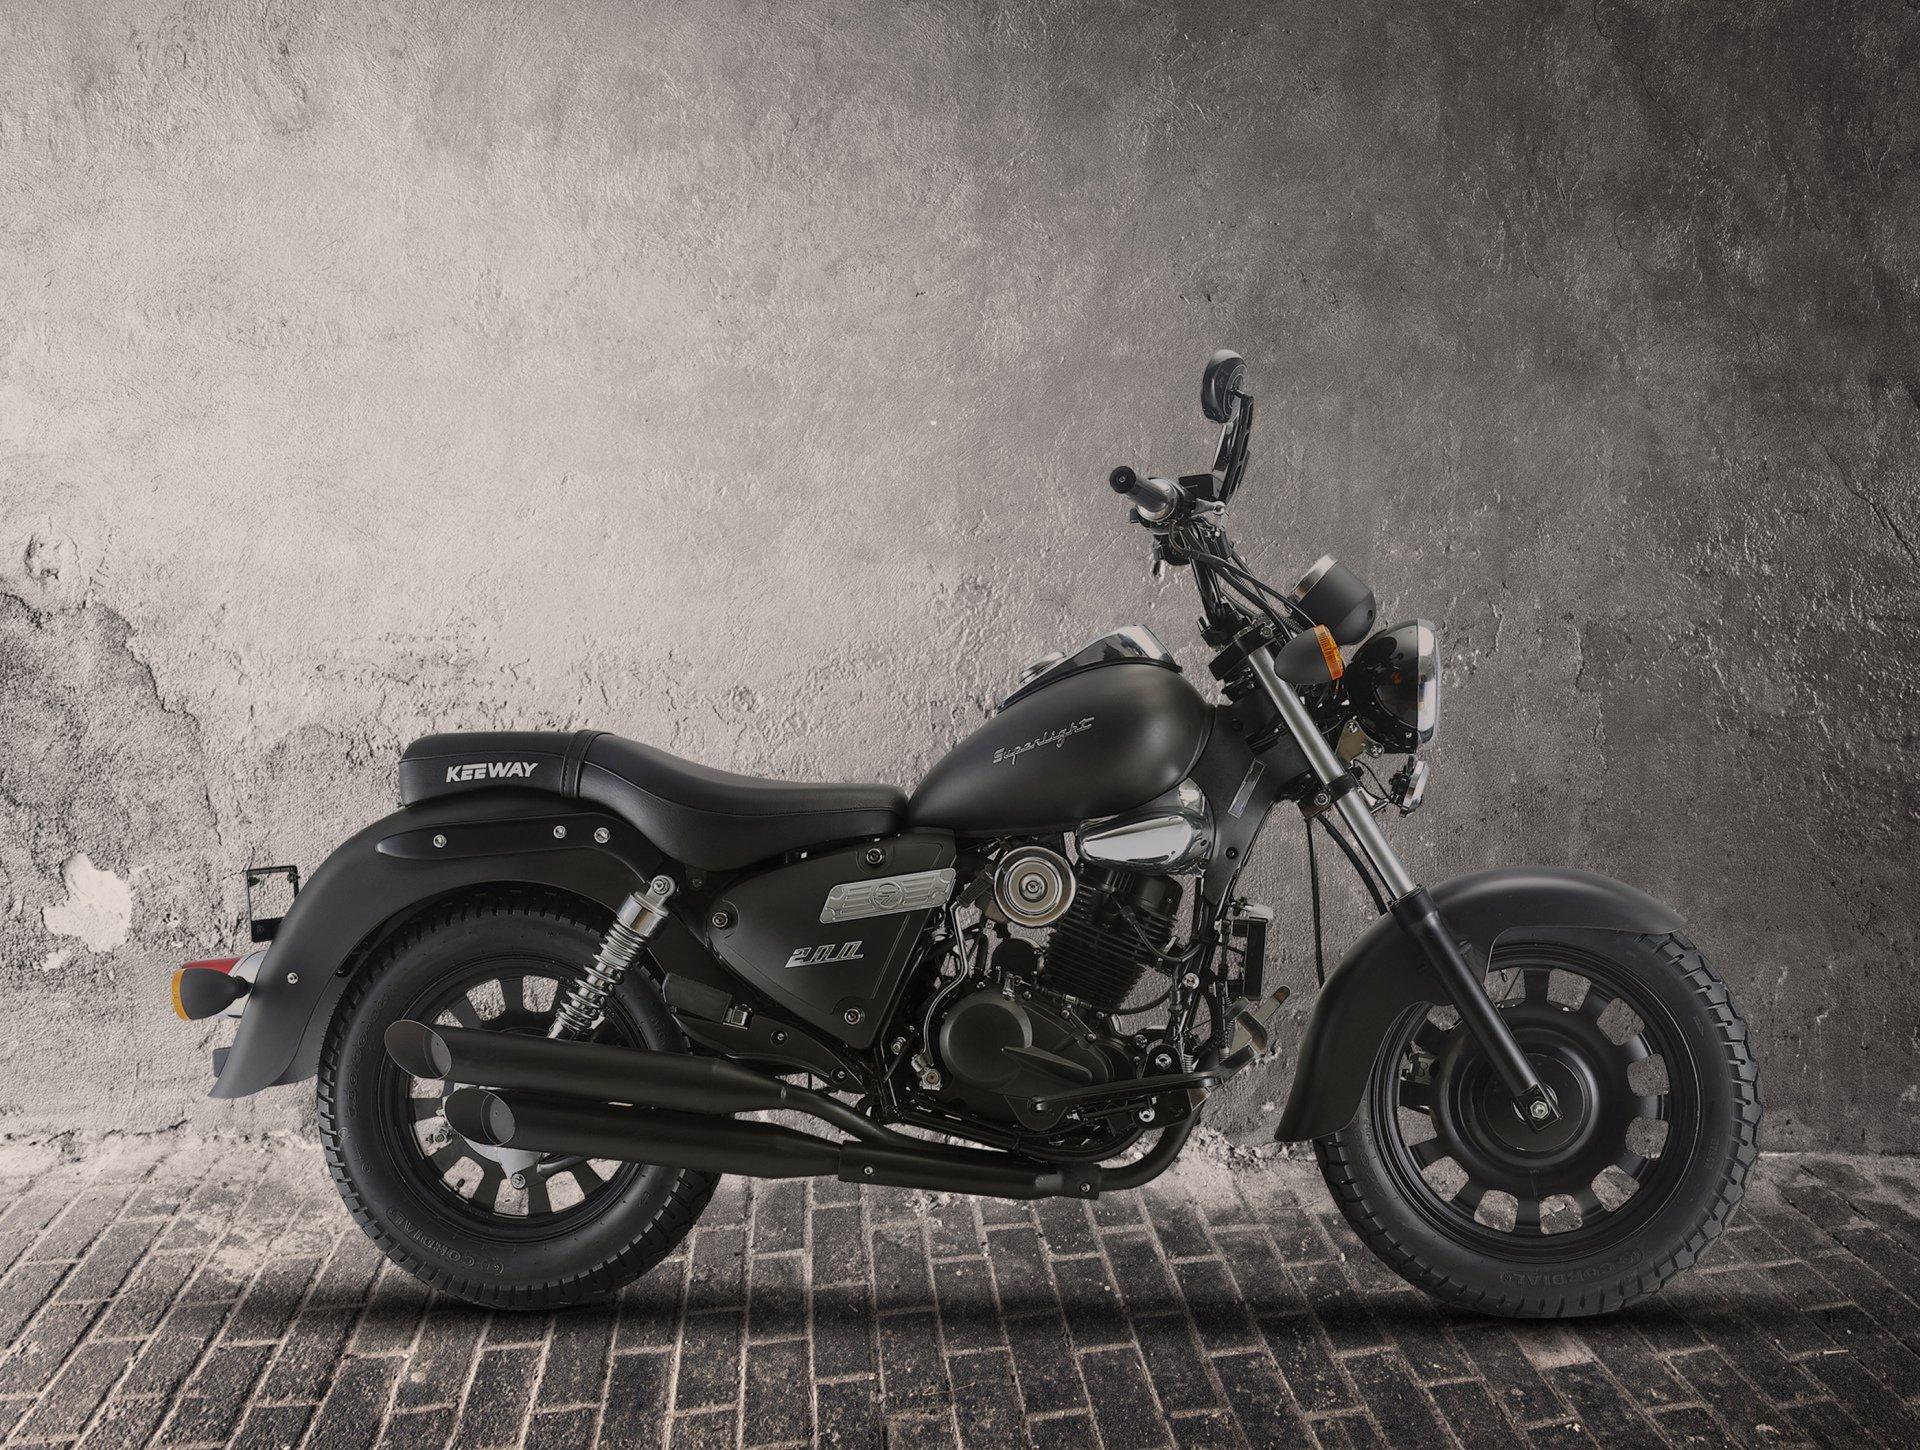 Motorbike Accessories At Amr Motorcycles Ltd Renfrew